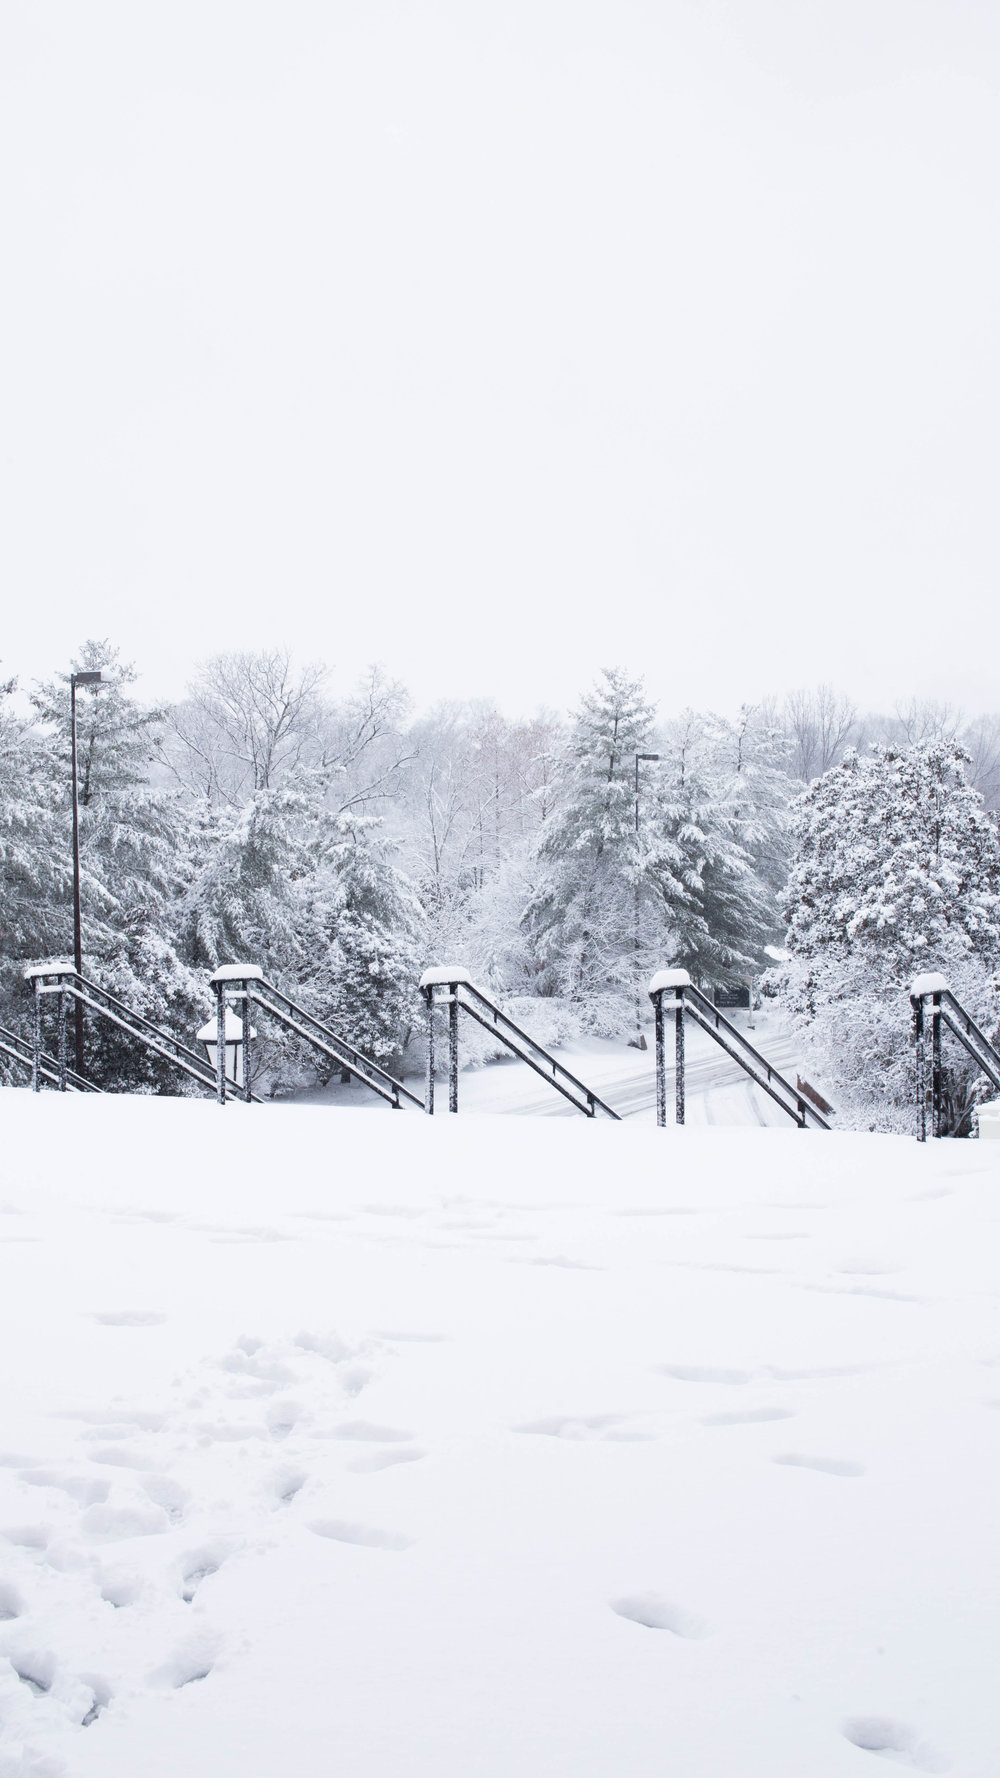 snow_2016 (1 of 2).jpg